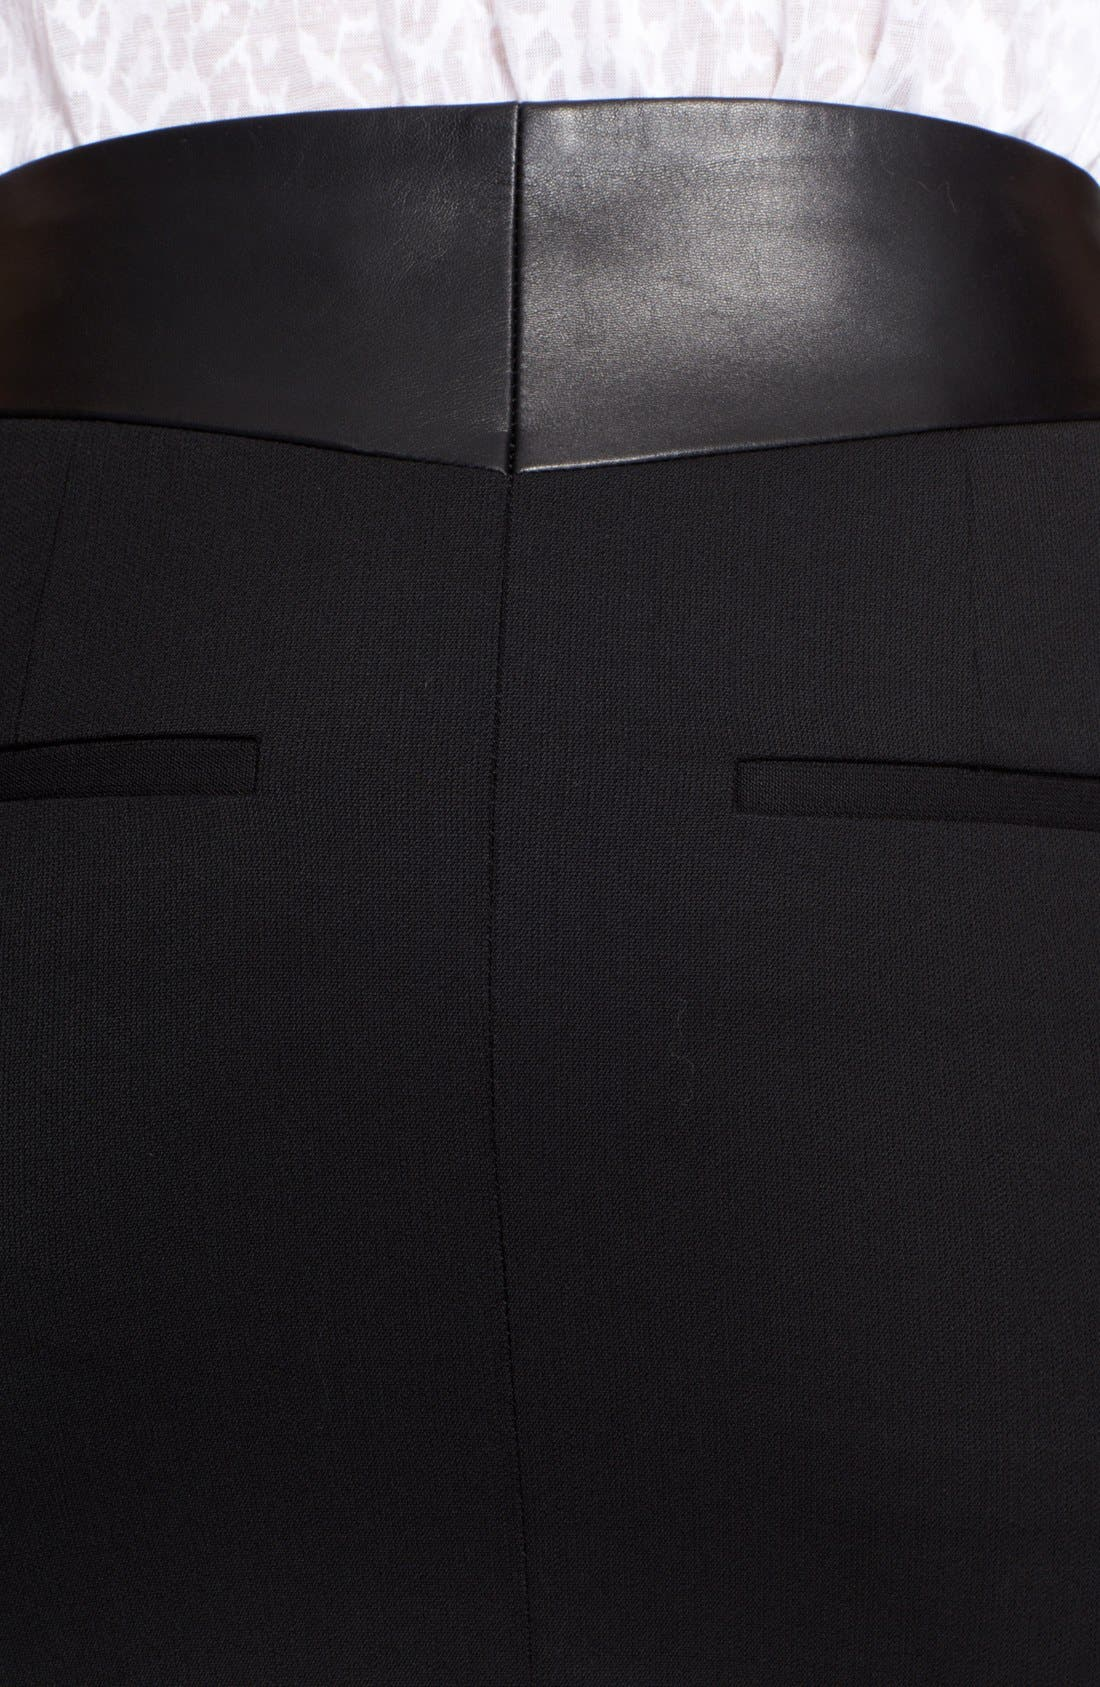 Alternate Image 3  - The Kooples Leather Yoke Zip Detail Miniskirt